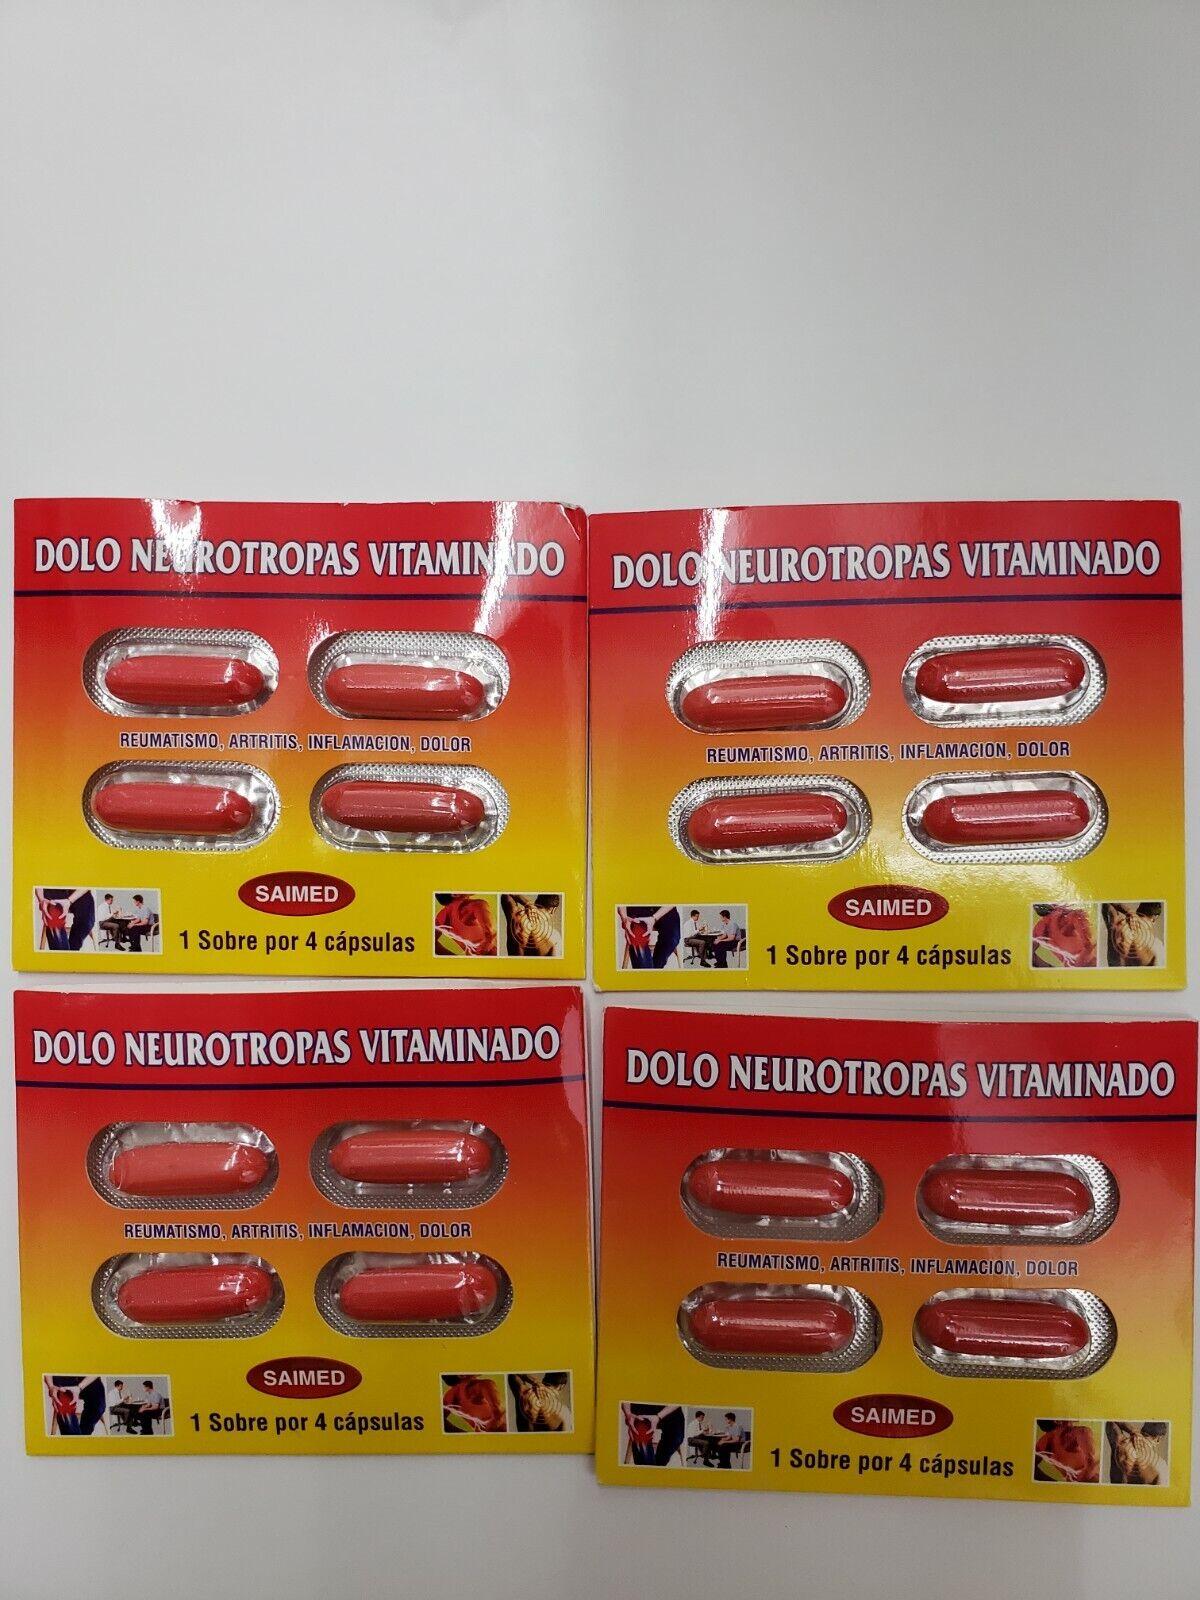 Dolo Neurotropas Vitaminado 4x4 16 capsulas